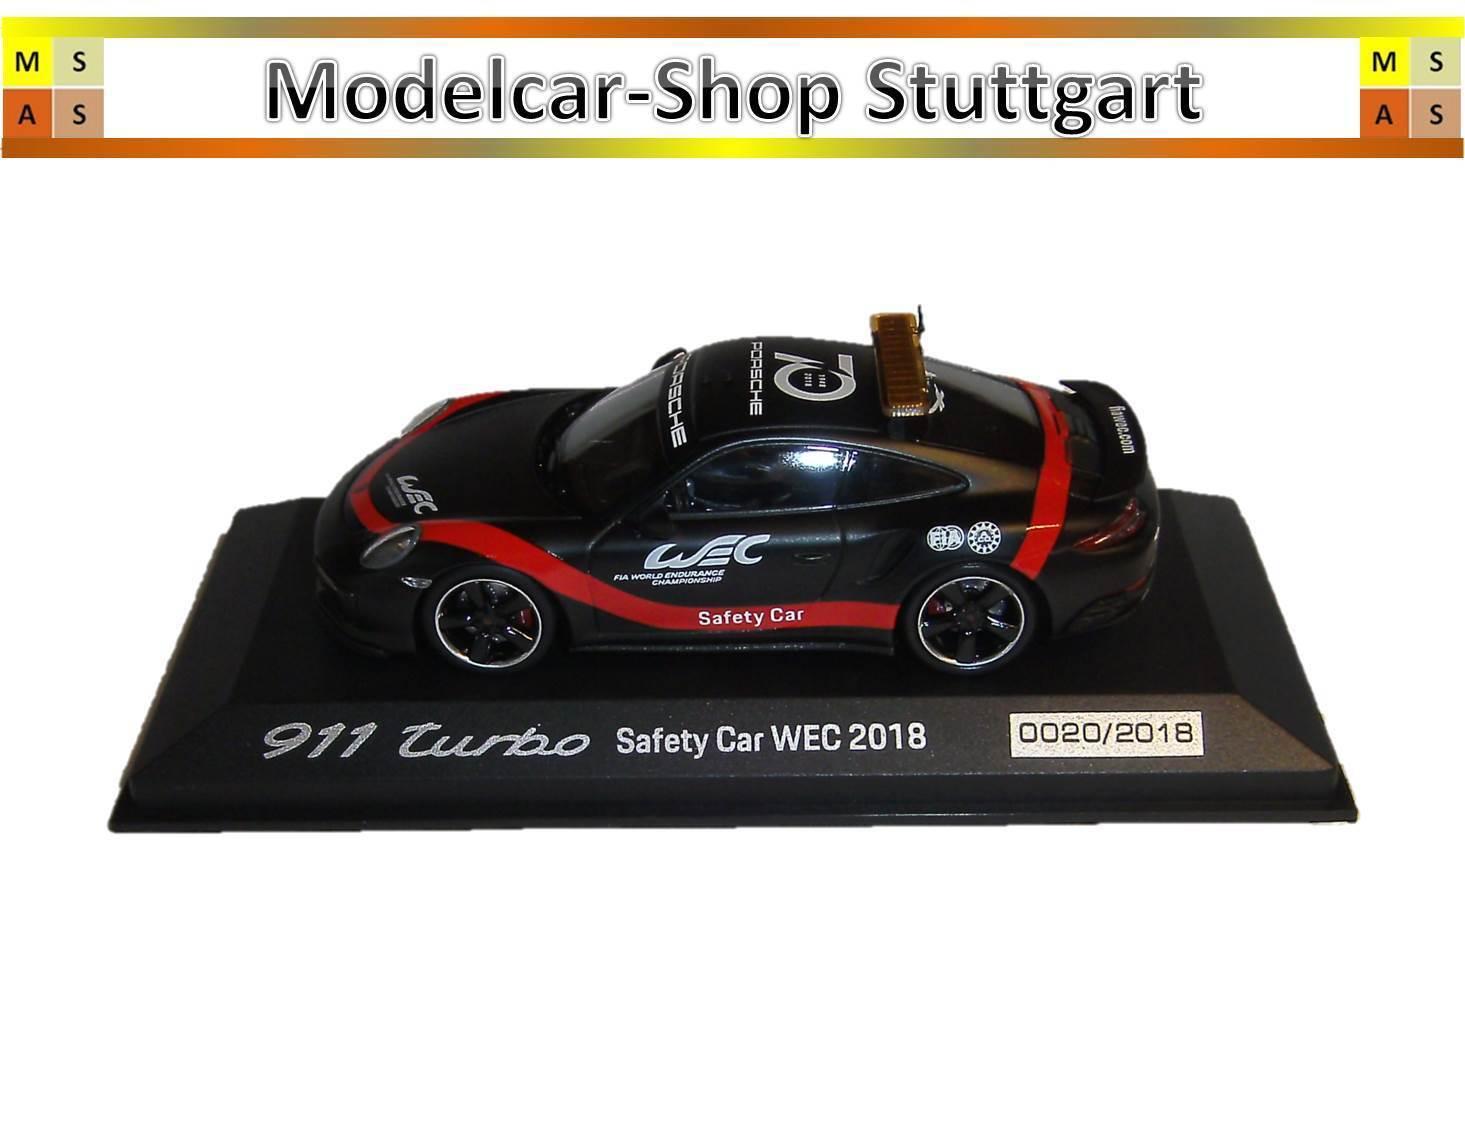 Porsche 911 Turbo Safety Car Wec 2018 - Minichamps 1 43 - WAP0209270K - New